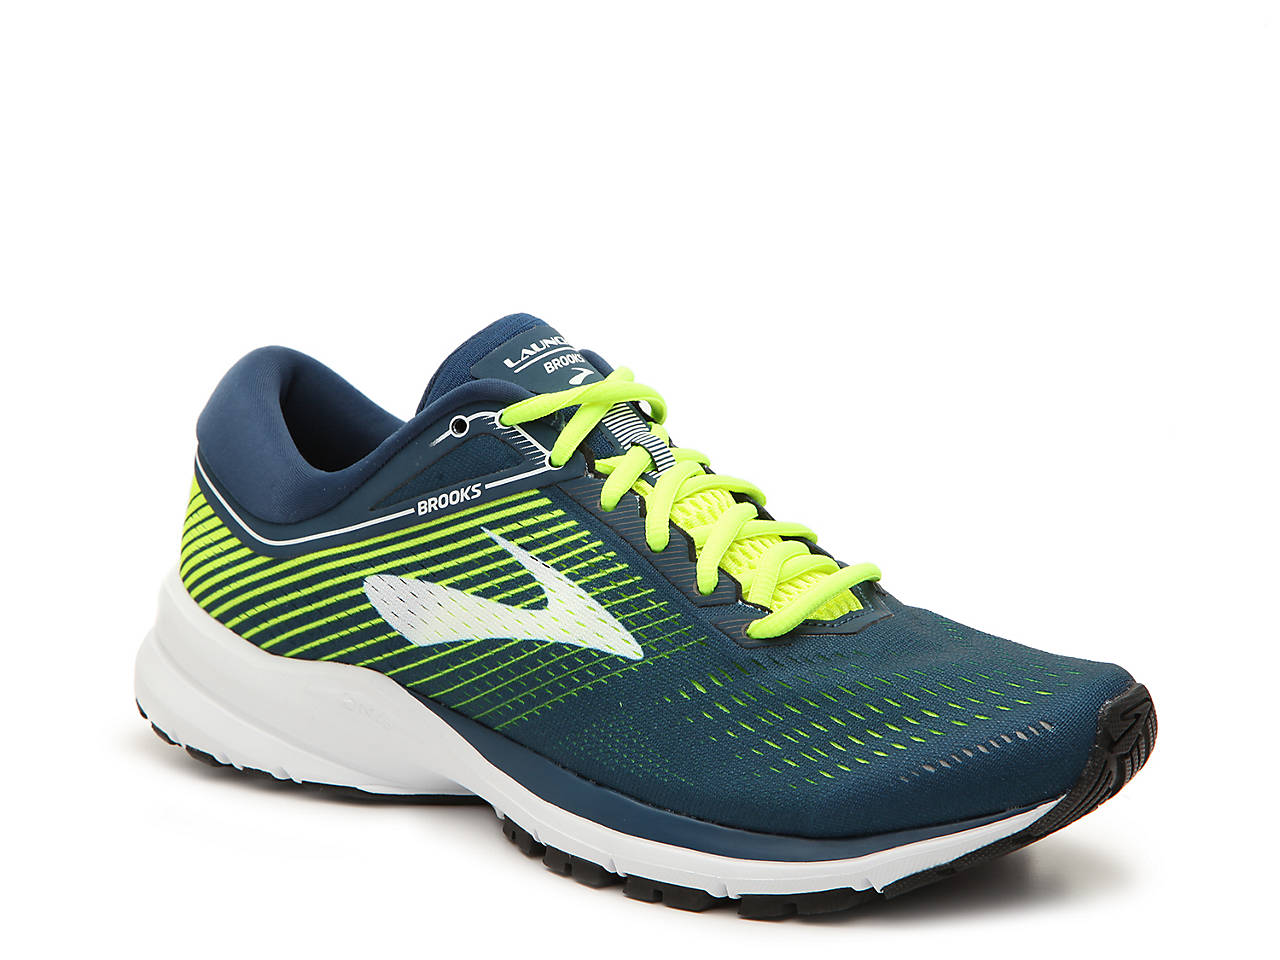 4150ab94315 Brooks Launch 5 Lightweight Performance Running Shoe - Men s Men s ...